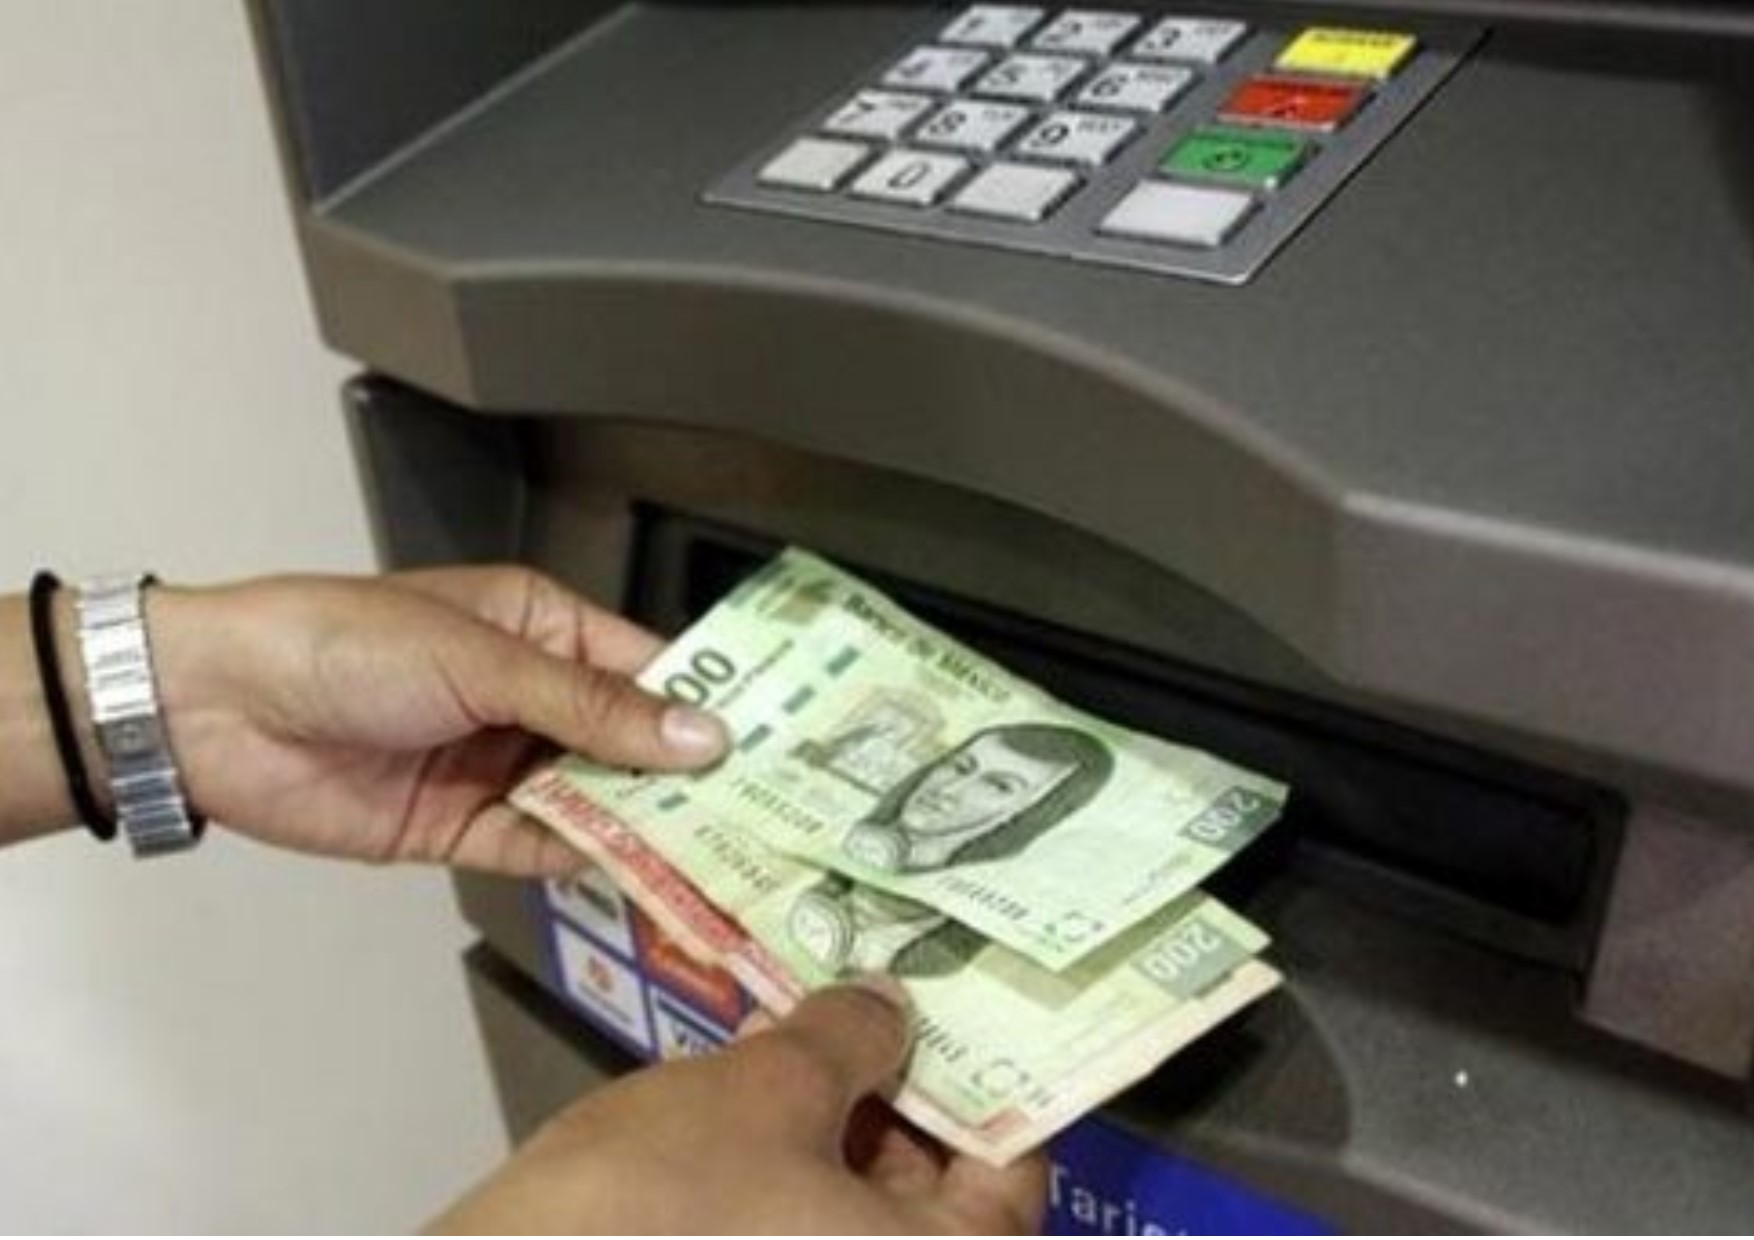 Inflación en México bajará drásticamente este año, prevé FMI